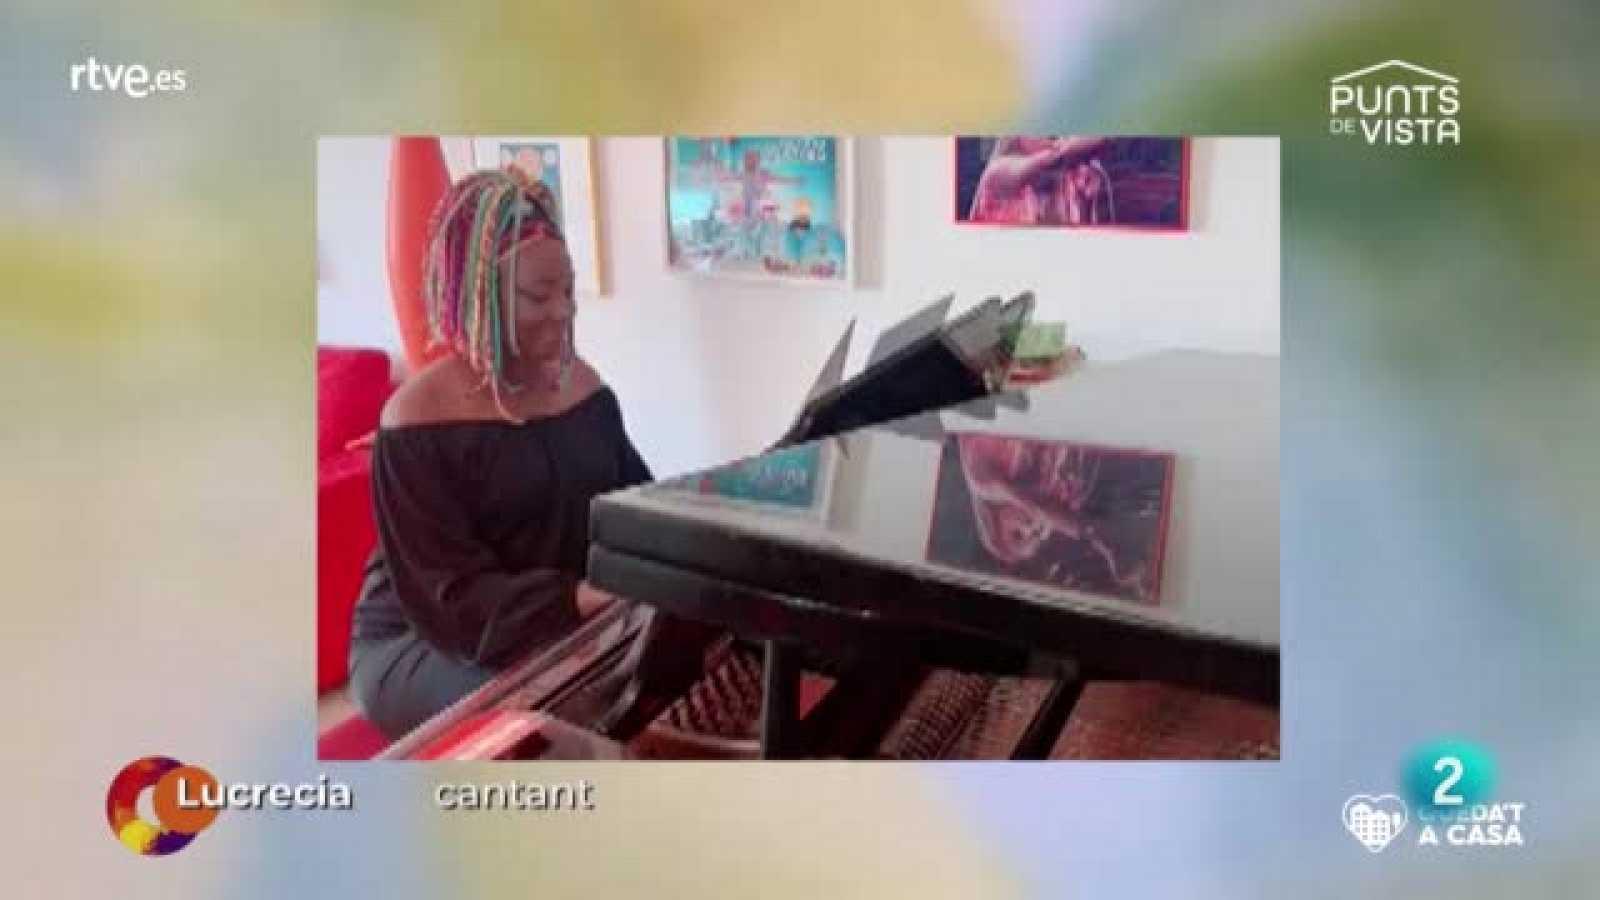 Punts de vista - Entrevista Lucrecia